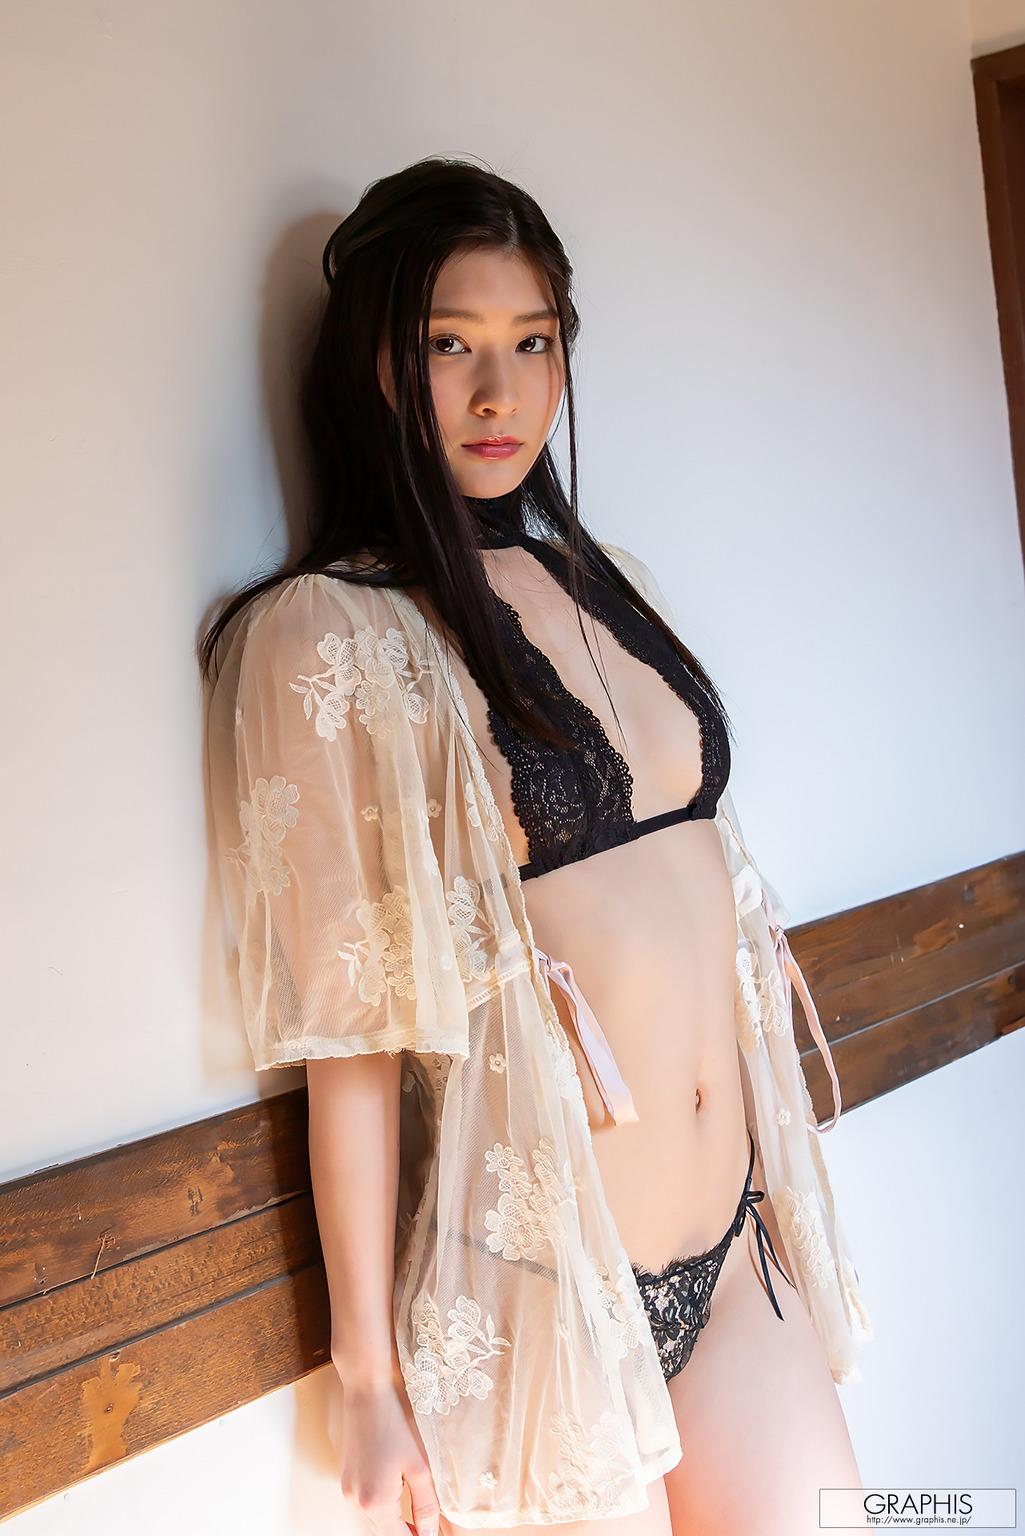 Suzu Honjo 本庄鈴, [Graphis] Gals 『 Deus Biei 』 (SPECIAL) Set.07 [20P] - 貼圖 - 清涼寫真 -